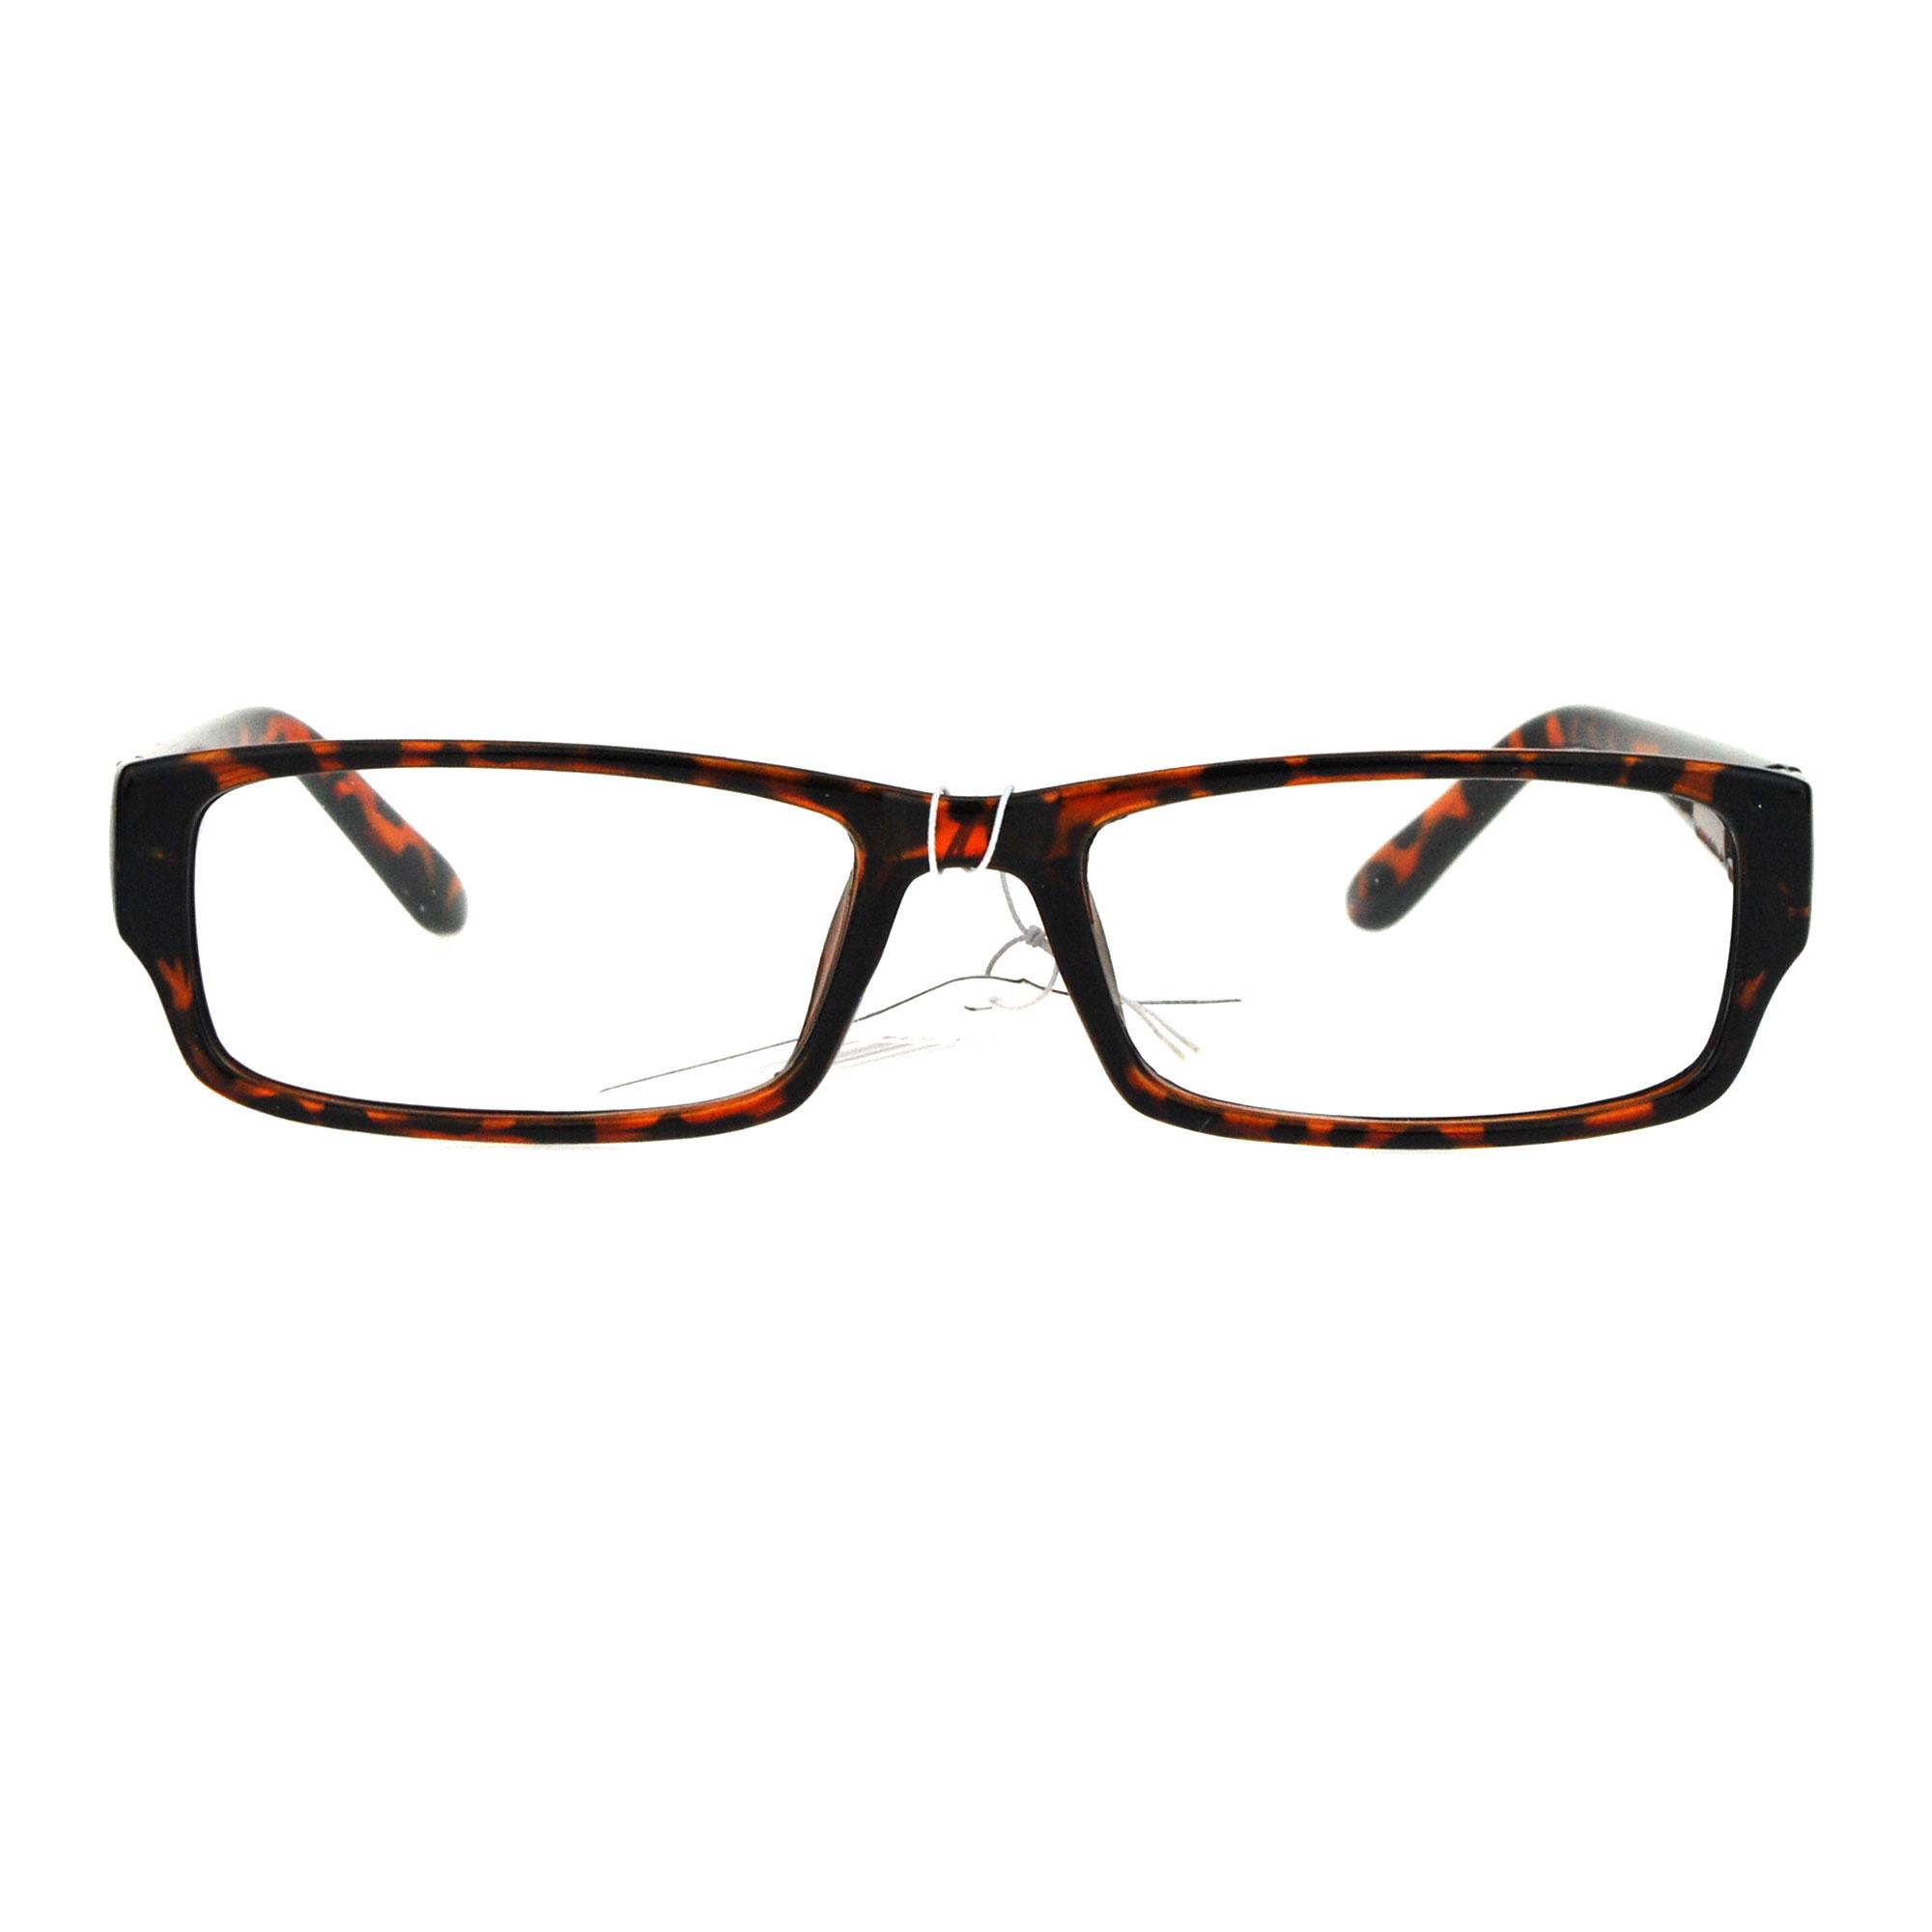 Mens Clear Plastic Eyeglass Frames : Mens Classic Narrow Rectangular Plastic Clear Lens Eye ...